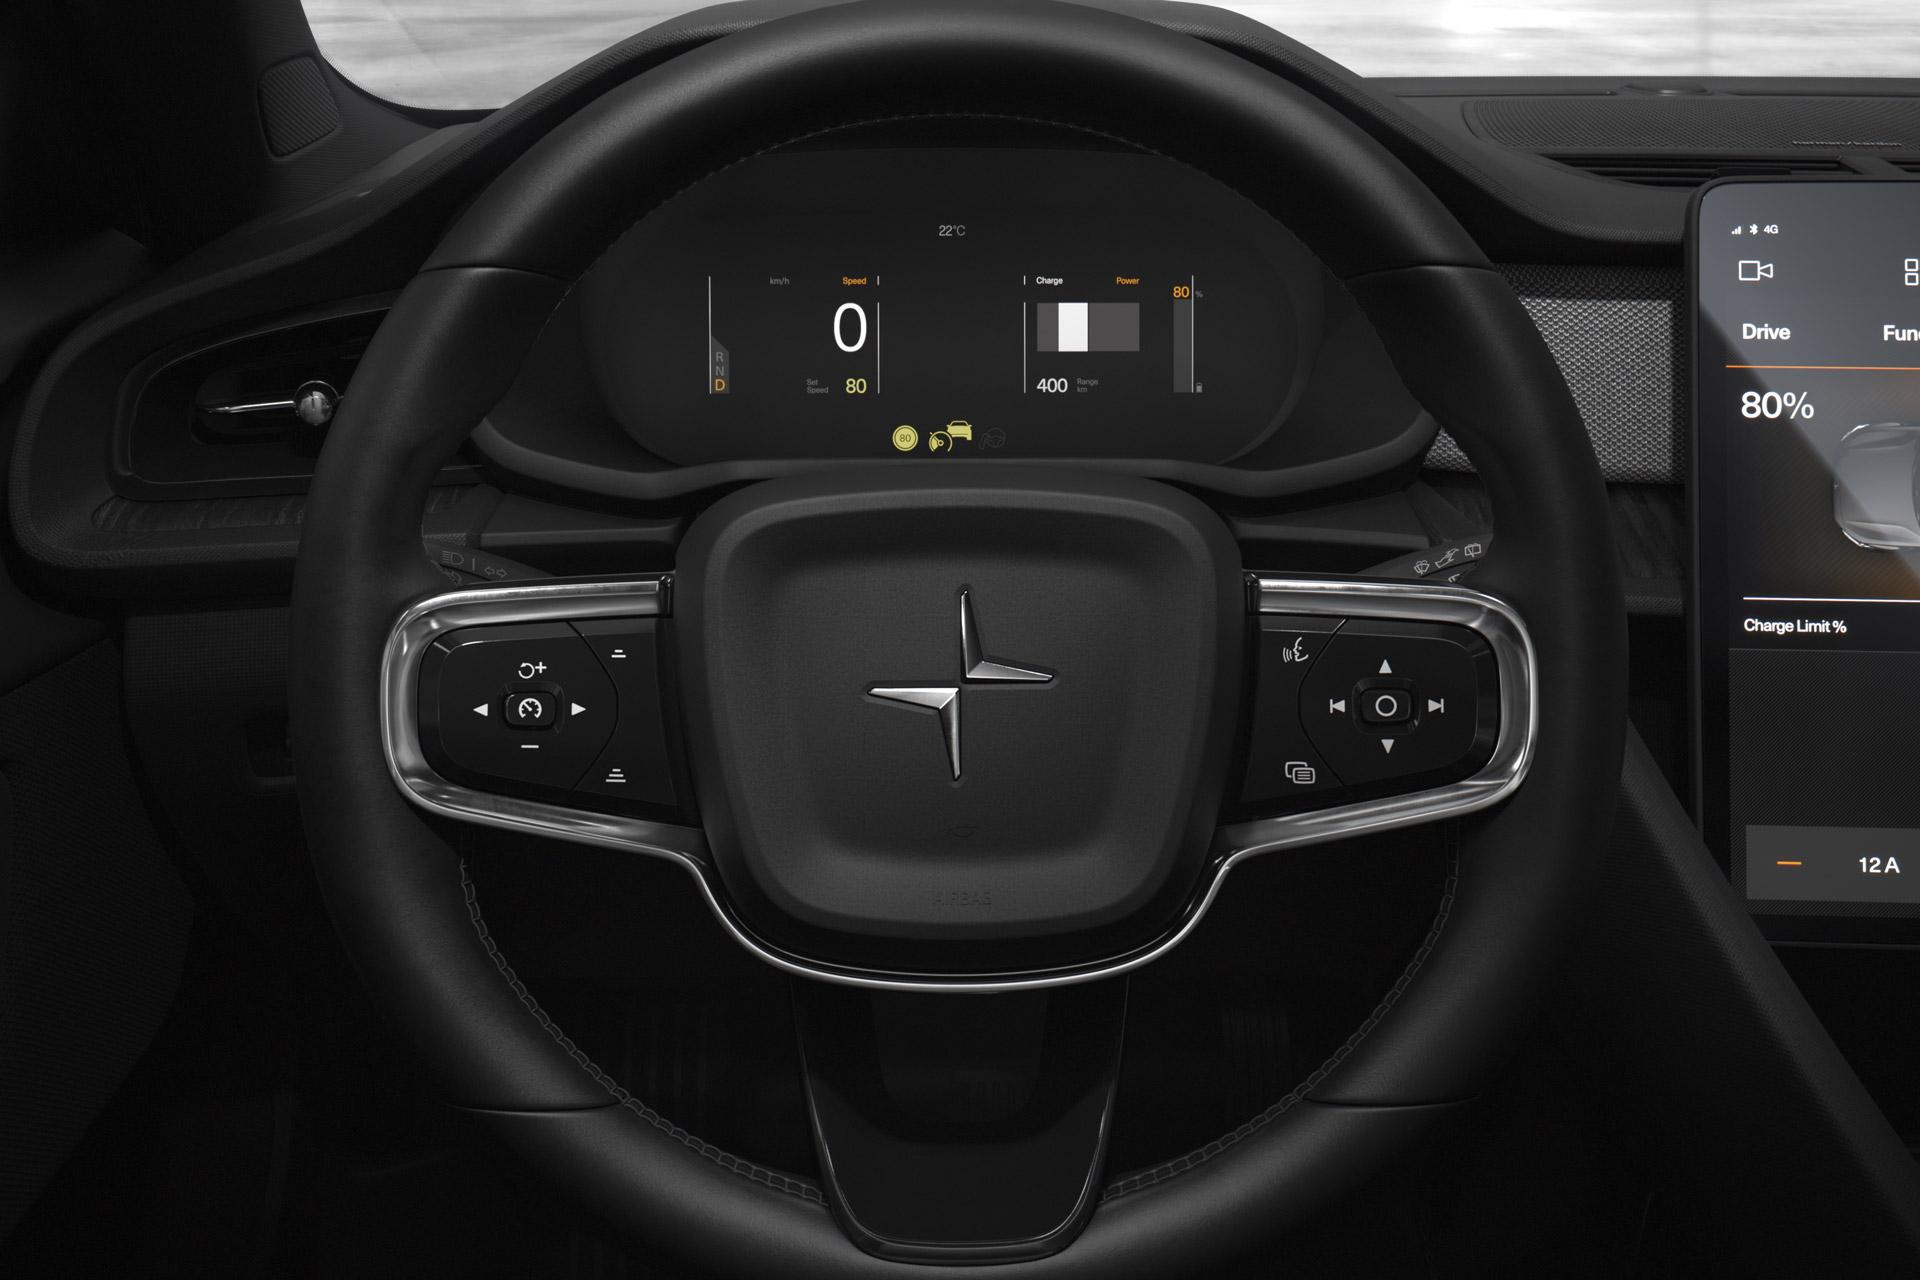 Polestar 2 Steering Wheel